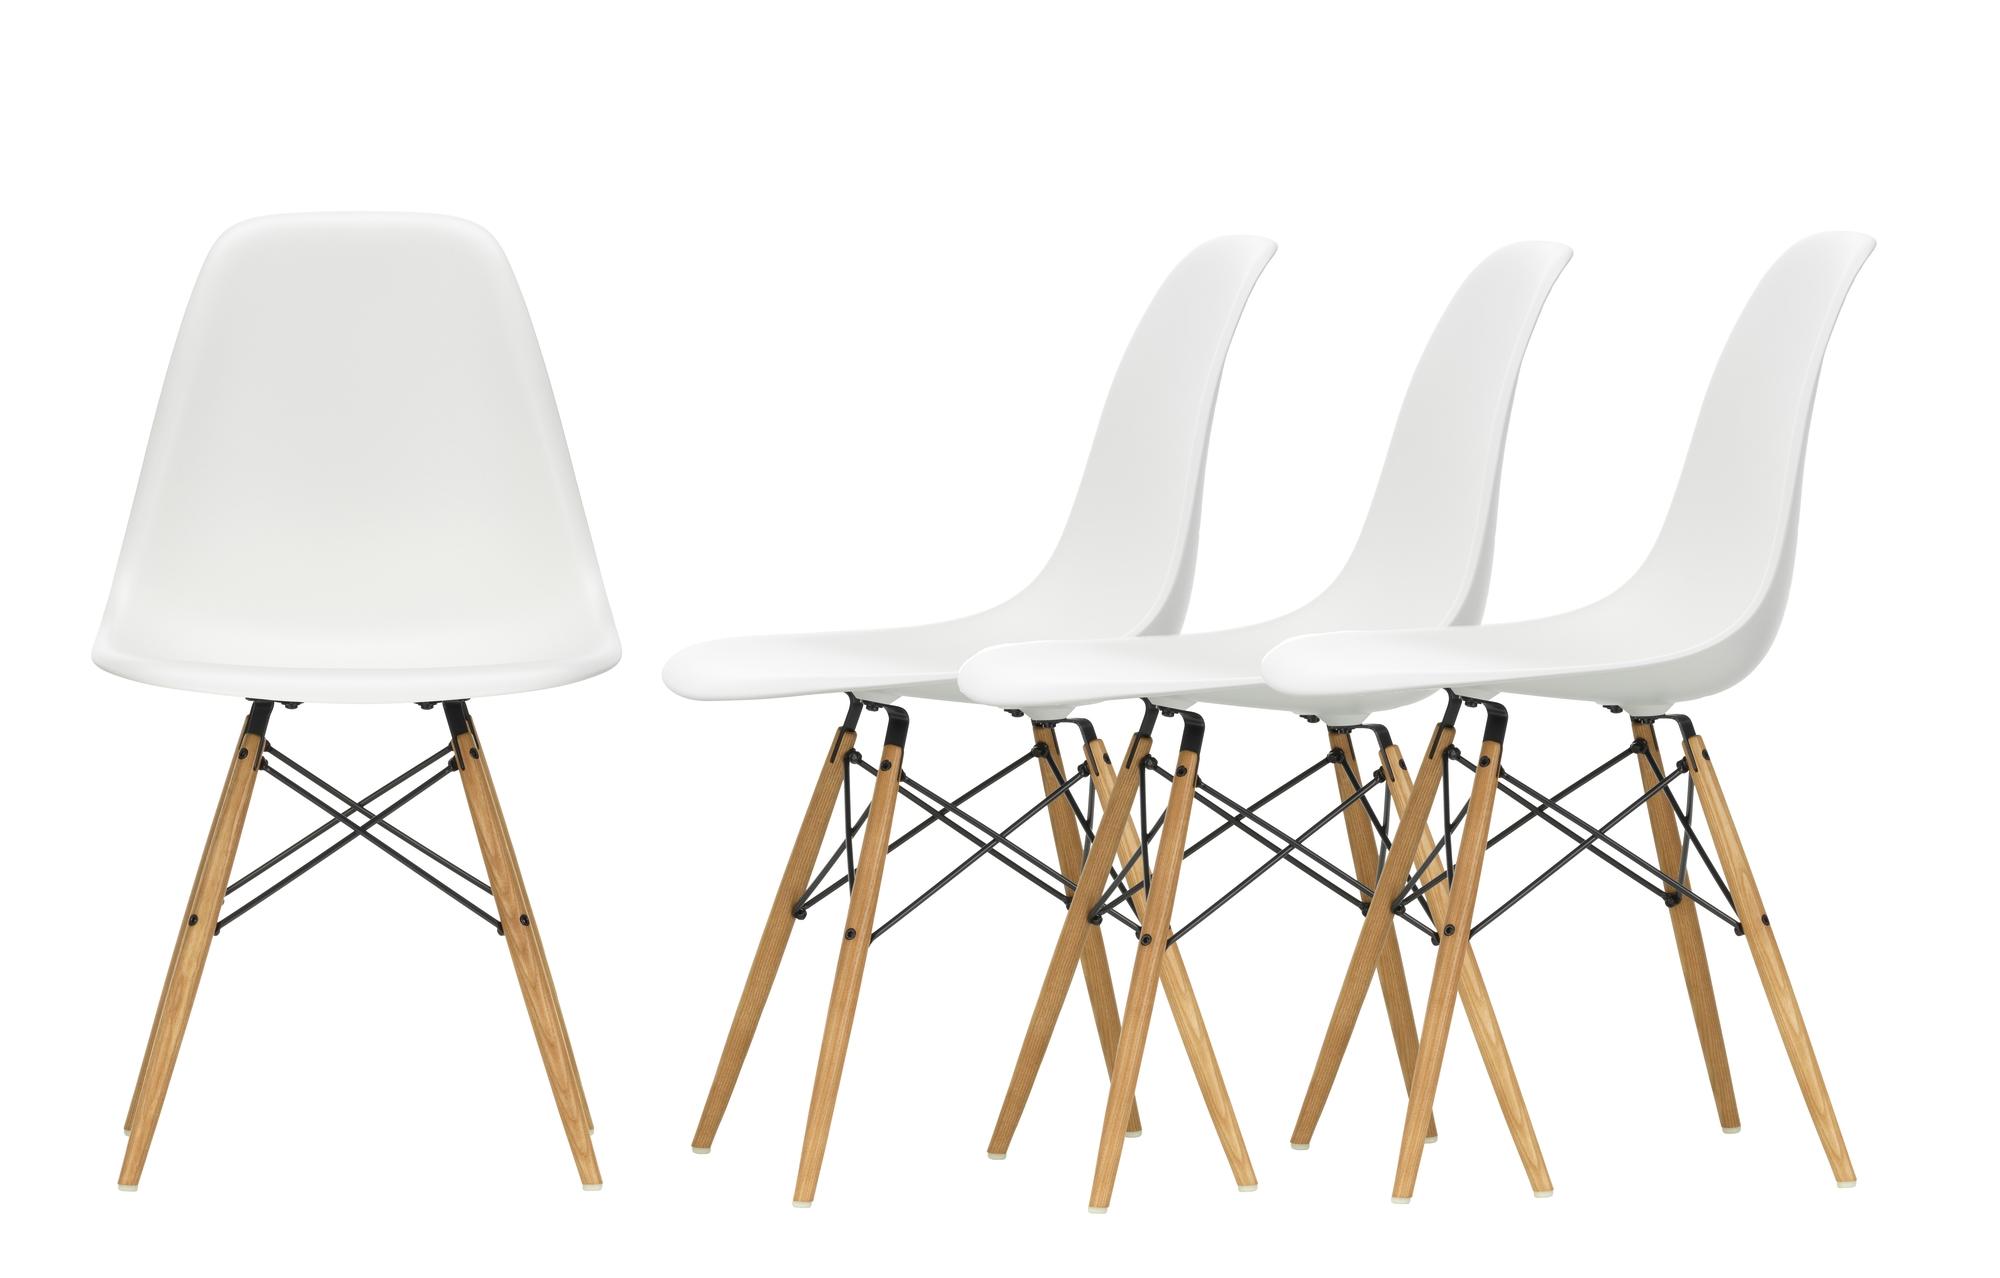 Aktion Eames Plastic Side Chair DSW Stuhl 4-er Set Vitra